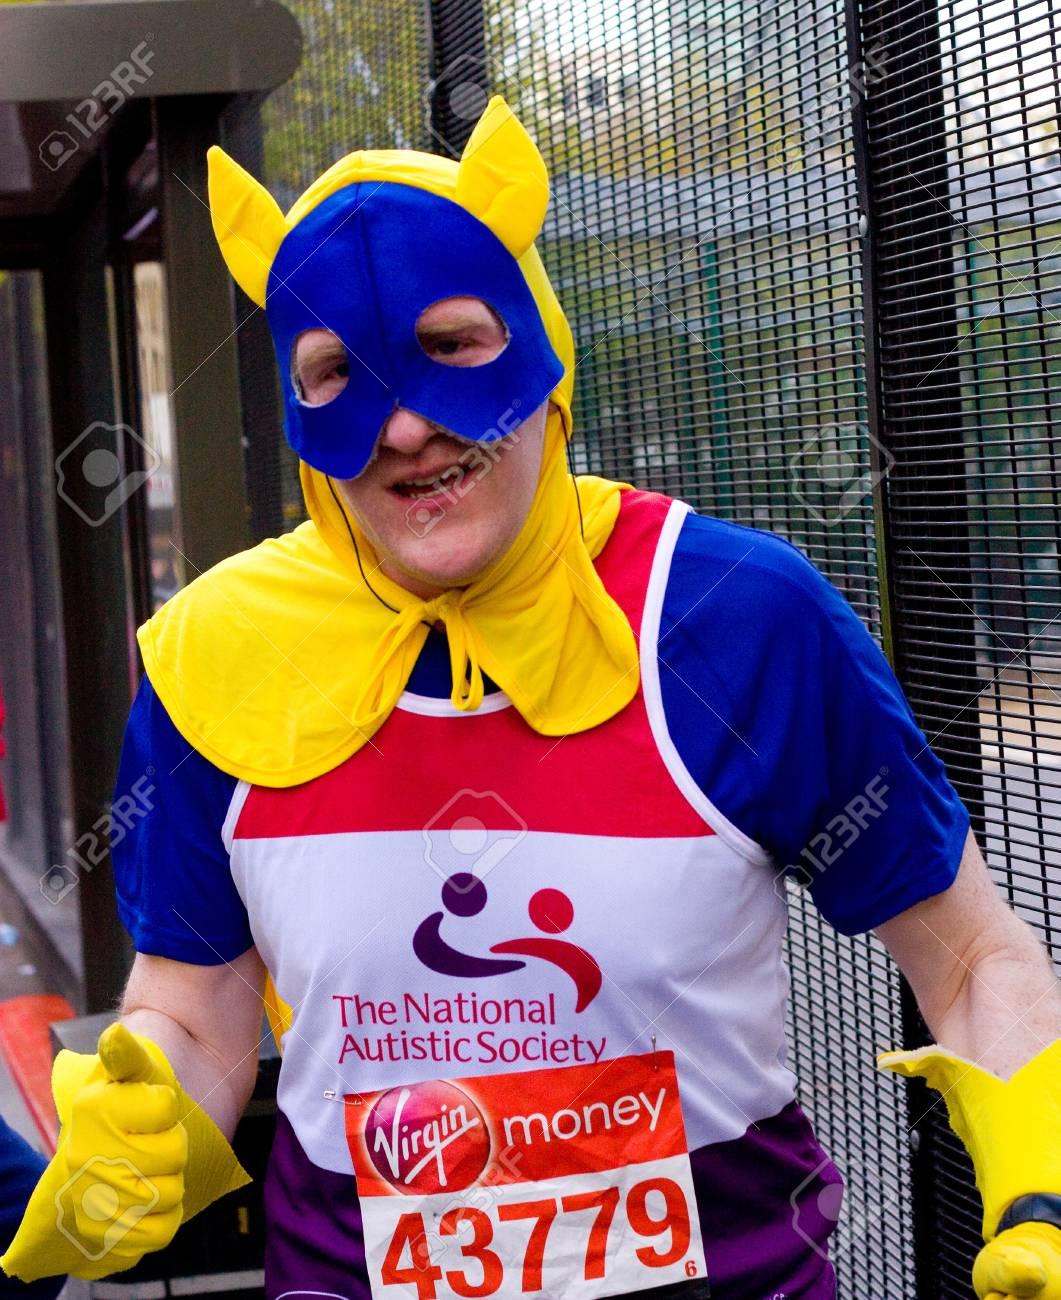 LONDON - APRIL 22: Unidentified man runs the London marathon on April 22, 2012 in London, England, UK. The marathon is an annual event. Stock Photo - 13316019